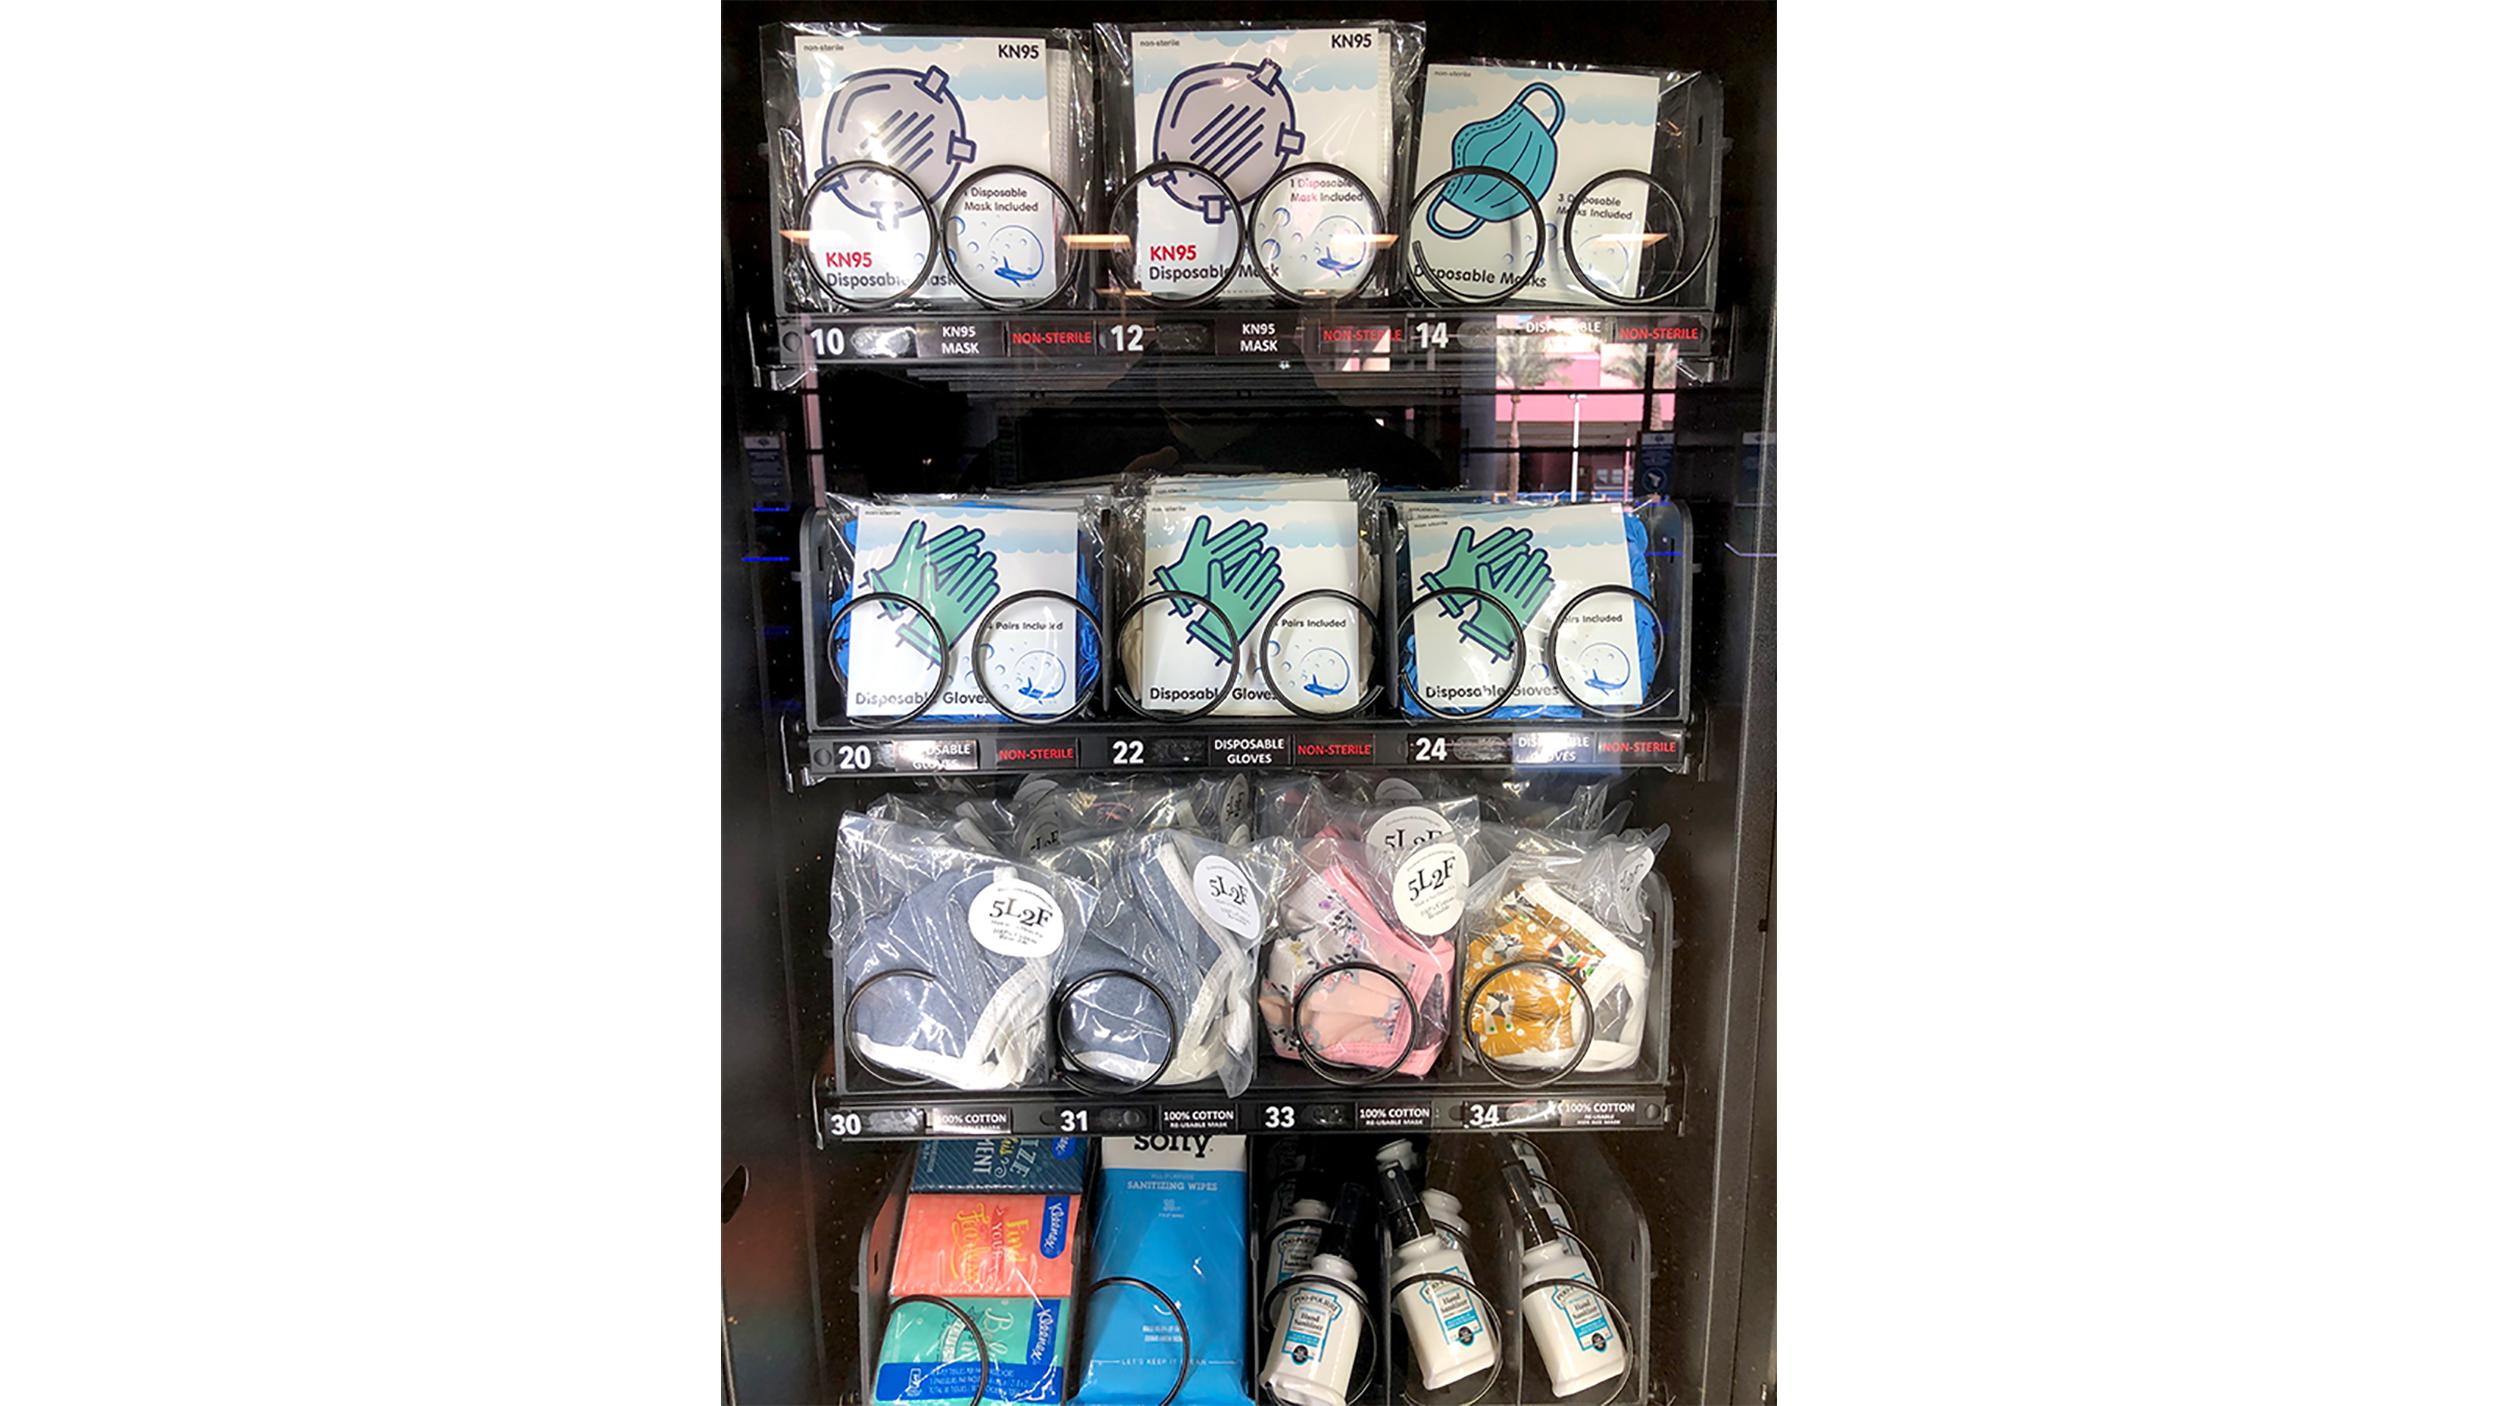 Coronavirus Us Las Vegas Airport Provides Personal Protective Equipment Vending Machines For Passengers Abc7 Chicago